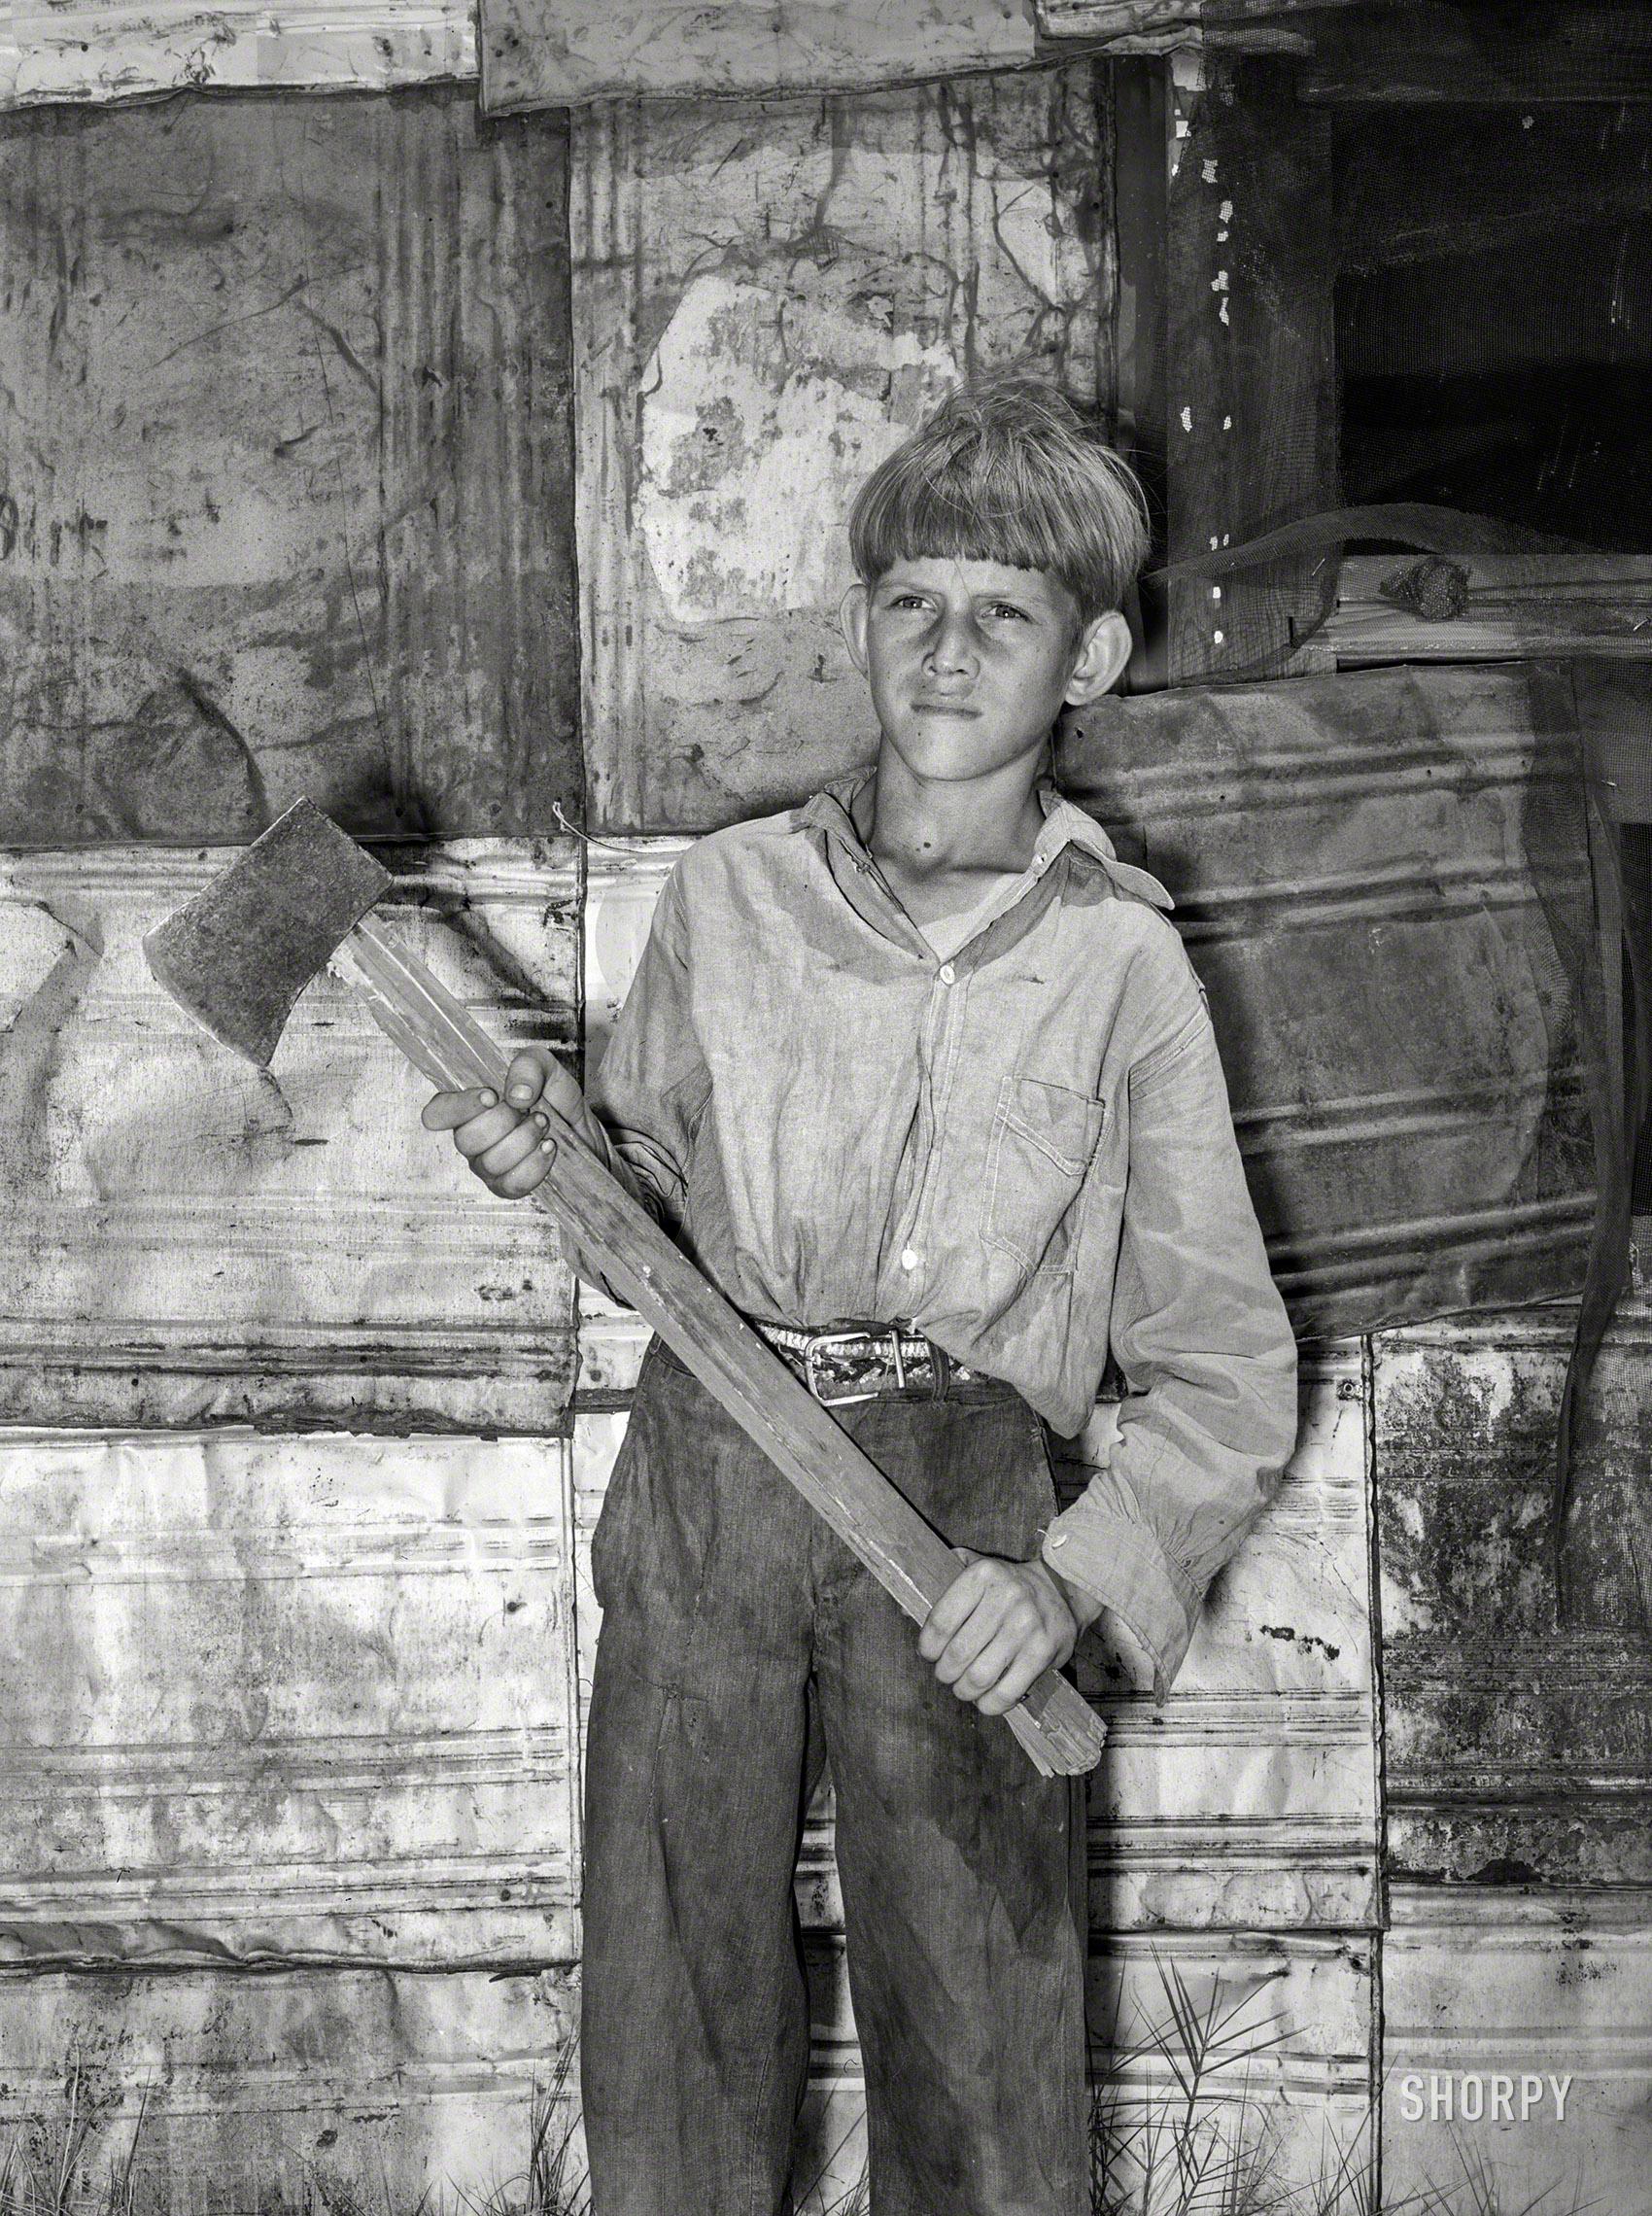 Shorpy Historical Picture Archive :: Marlboro Boy: 1939